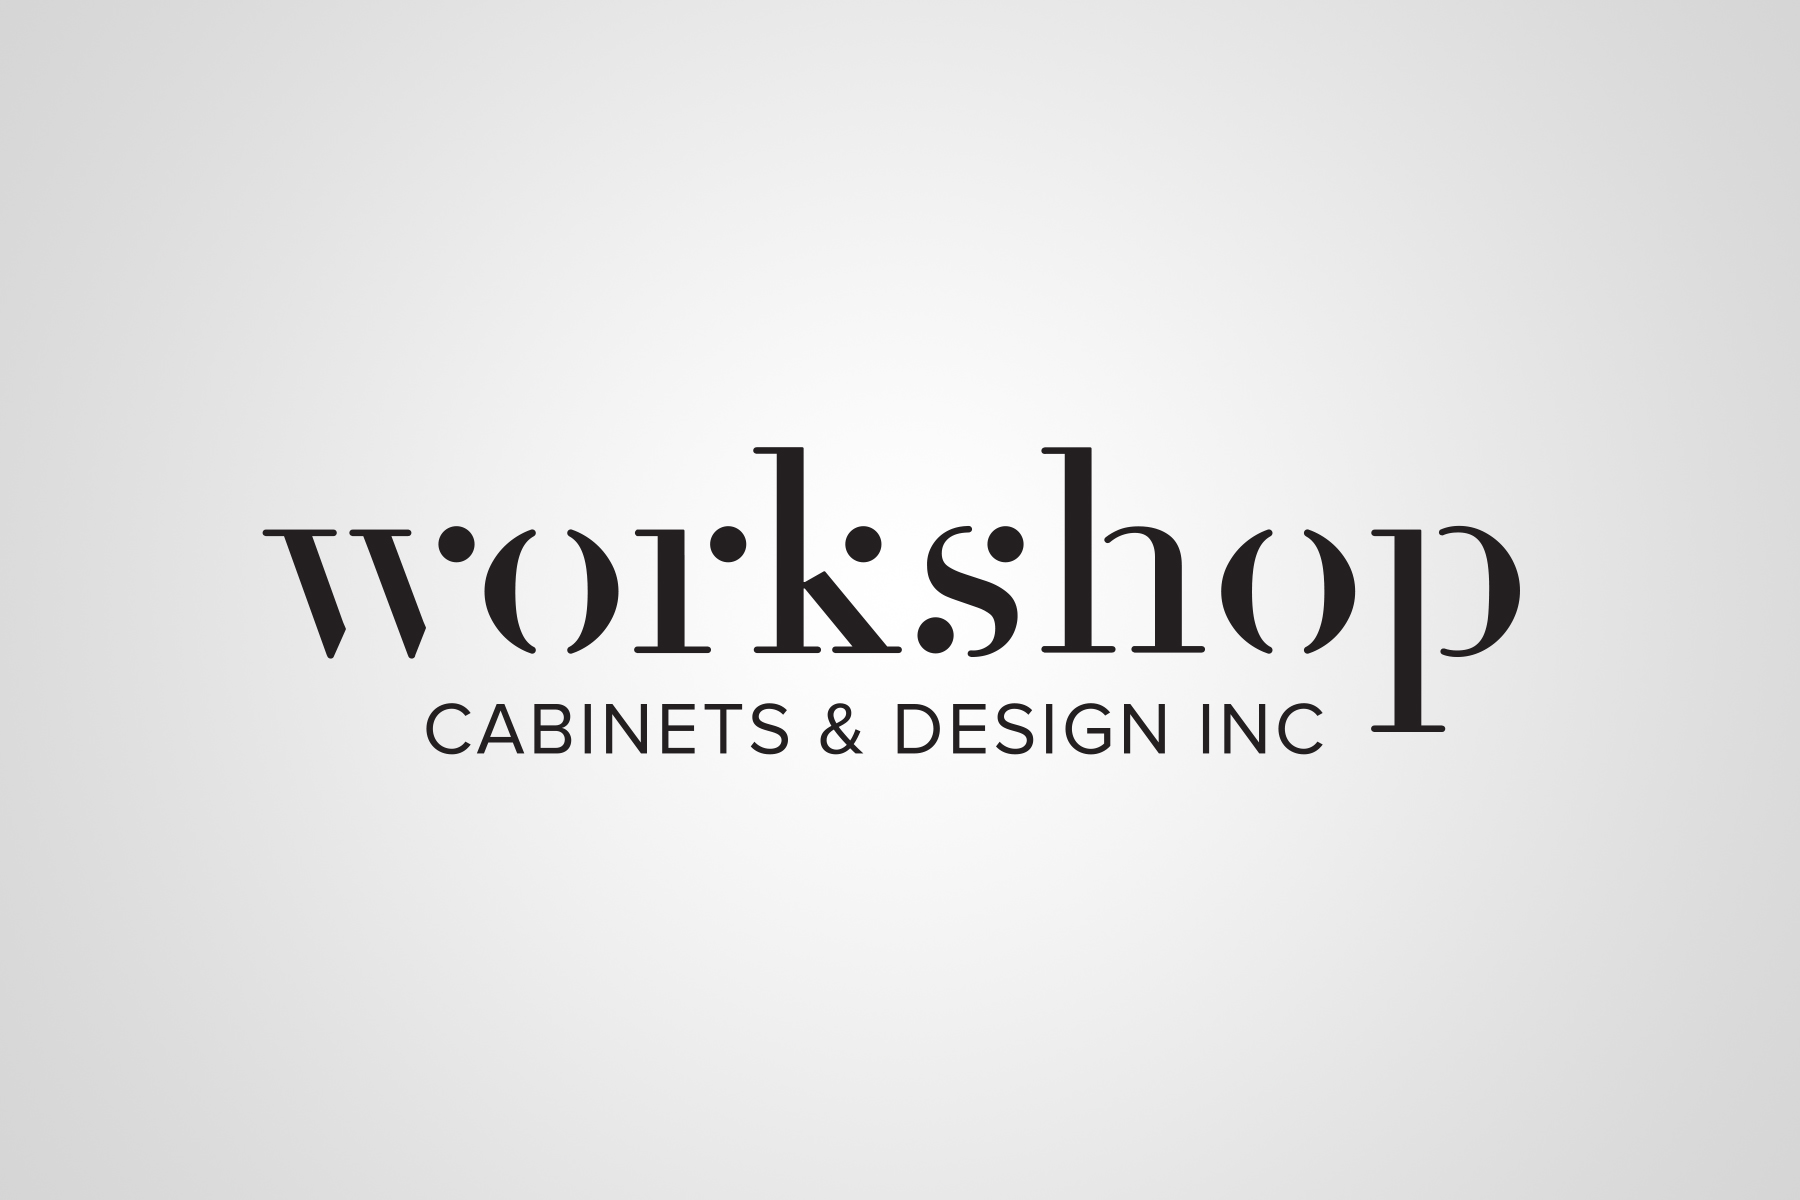 Workshop-Logos6.jpg